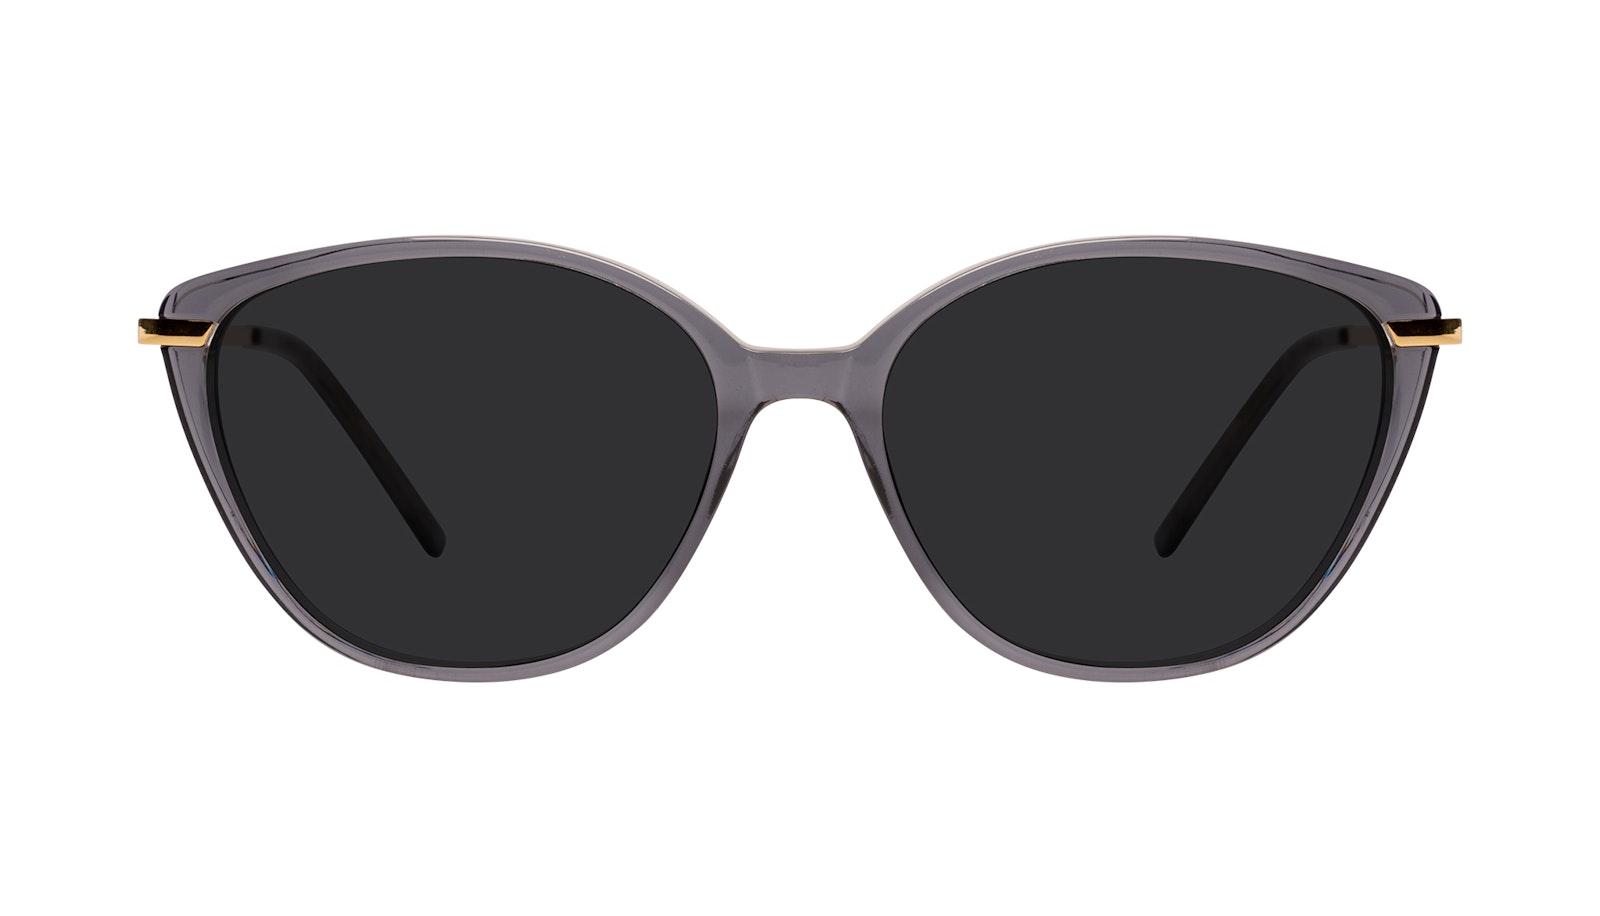 Affordable Fashion Glasses Cat Eye Sunglasses Women Illusion Plus Gold Shadow